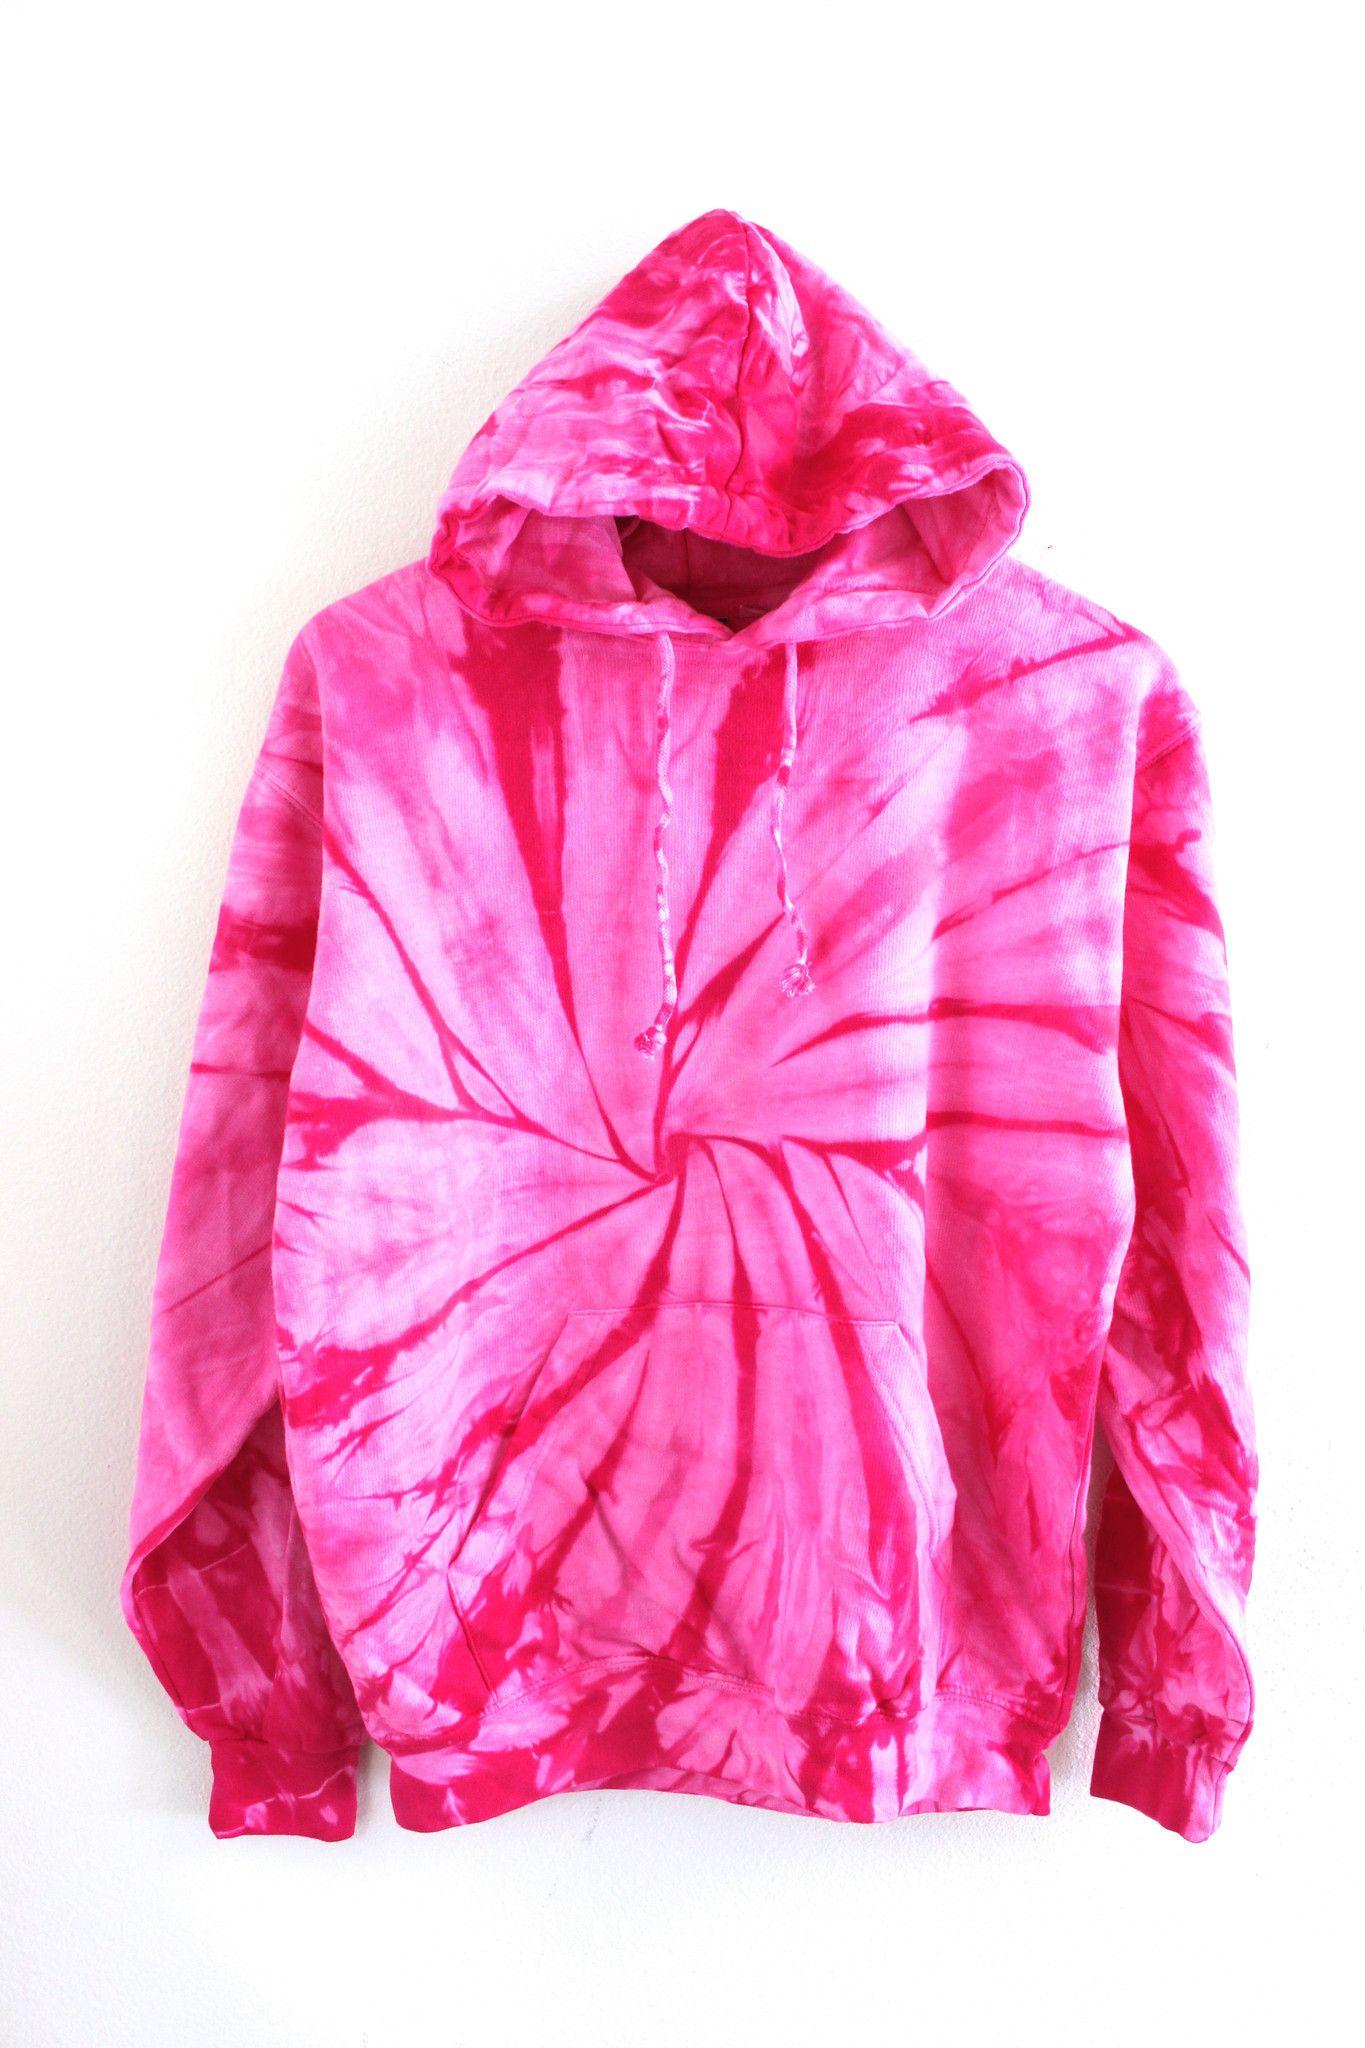 Cherry Blossom Tie Dye Hoodie Tie Dye Hoodie Tie Dye Fashion Tie Dye Outfits [ 2048 x 1365 Pixel ]